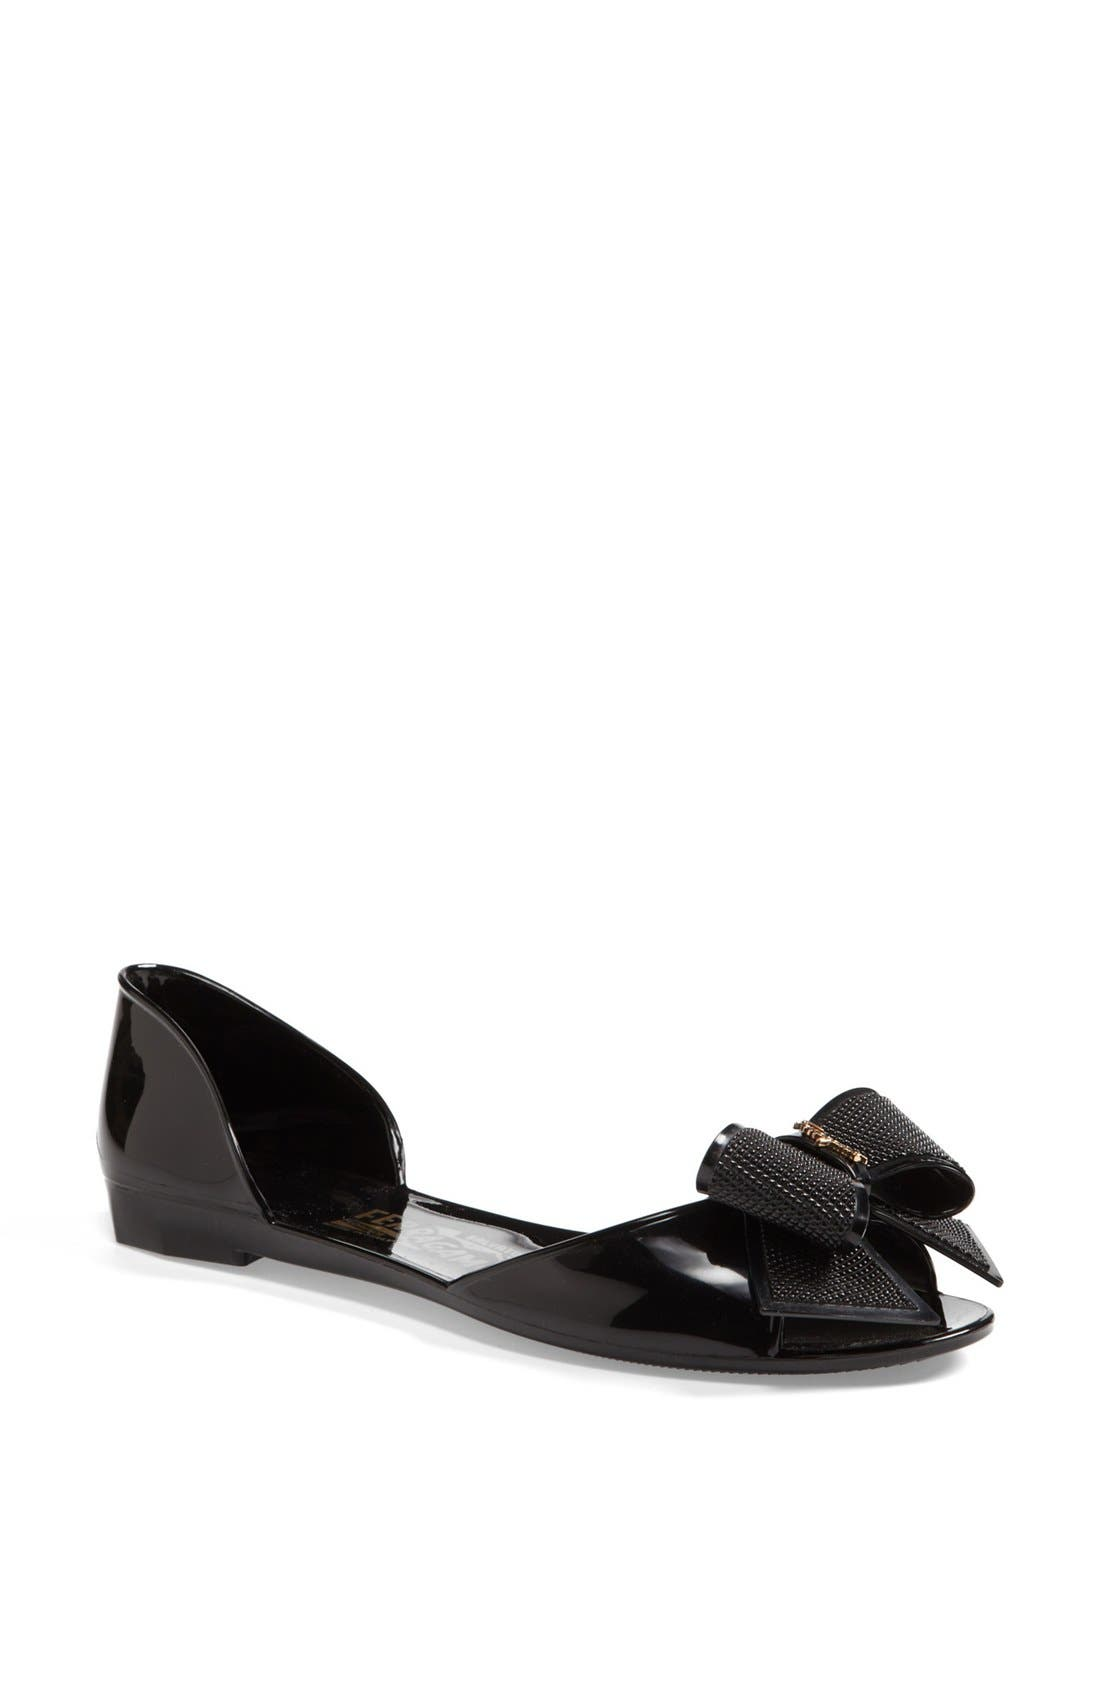 Main Image - Salvatore Ferragamo 'Barbados' Flat Sandal